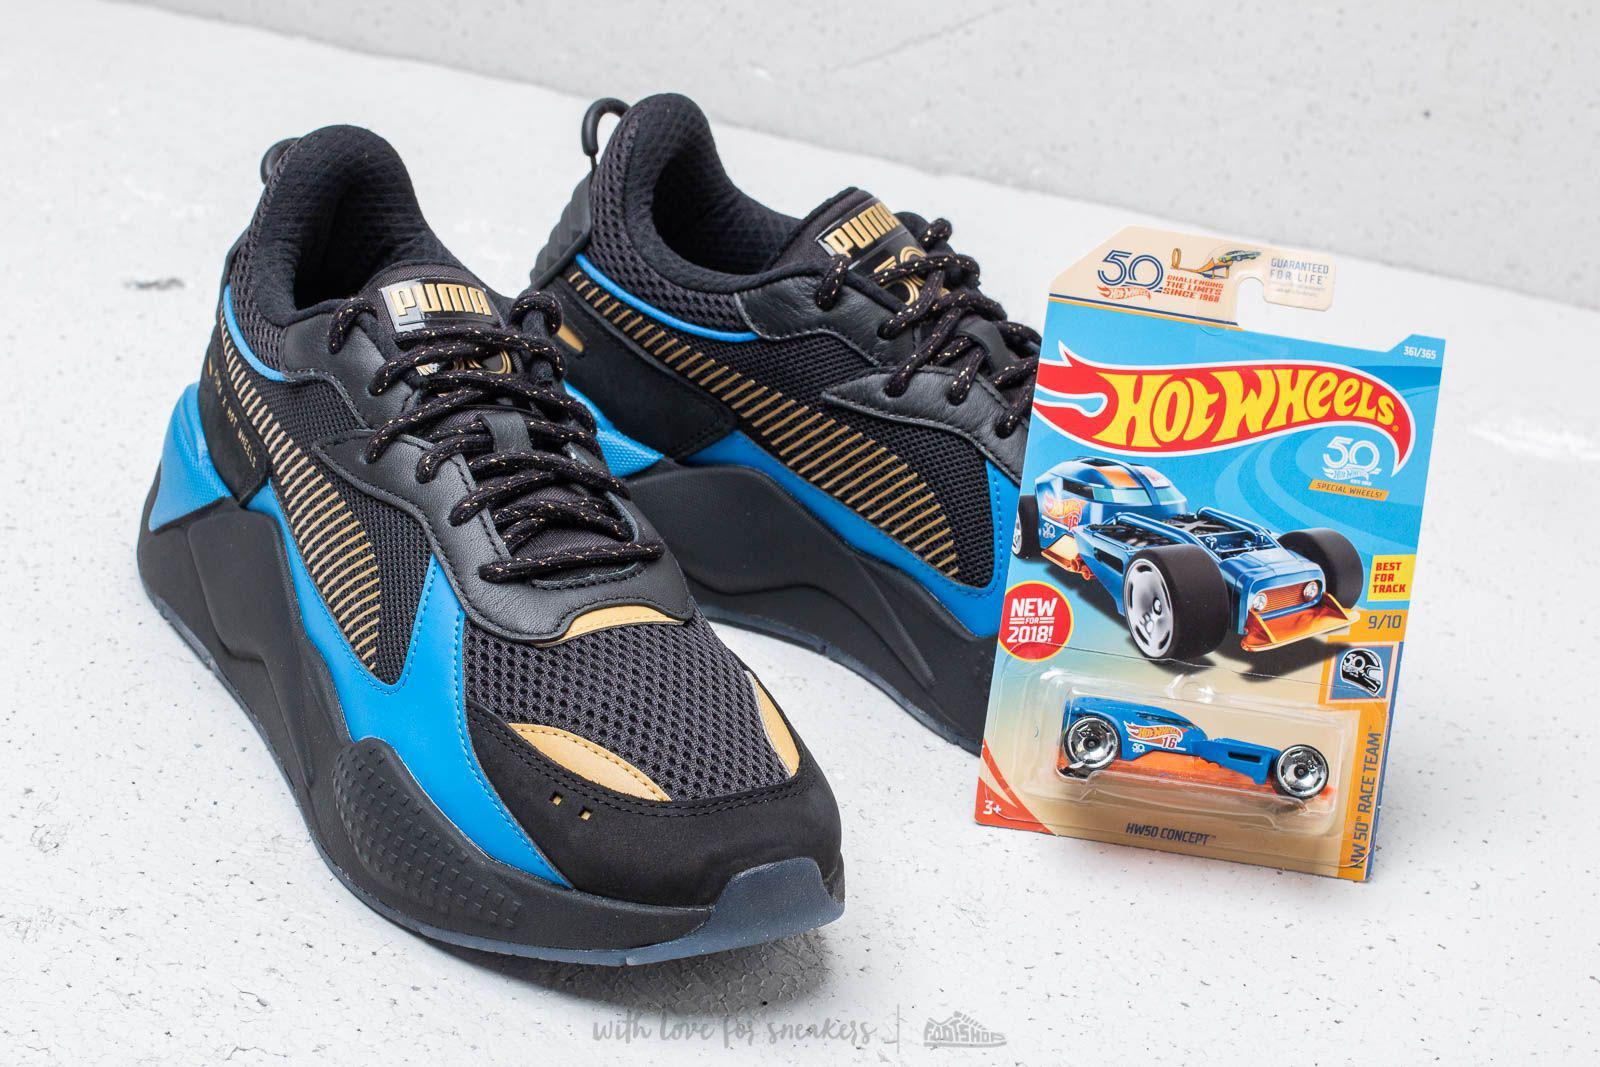 X Toys Hot Wheels Rs-x Bone Shaker Black/ Team Gold